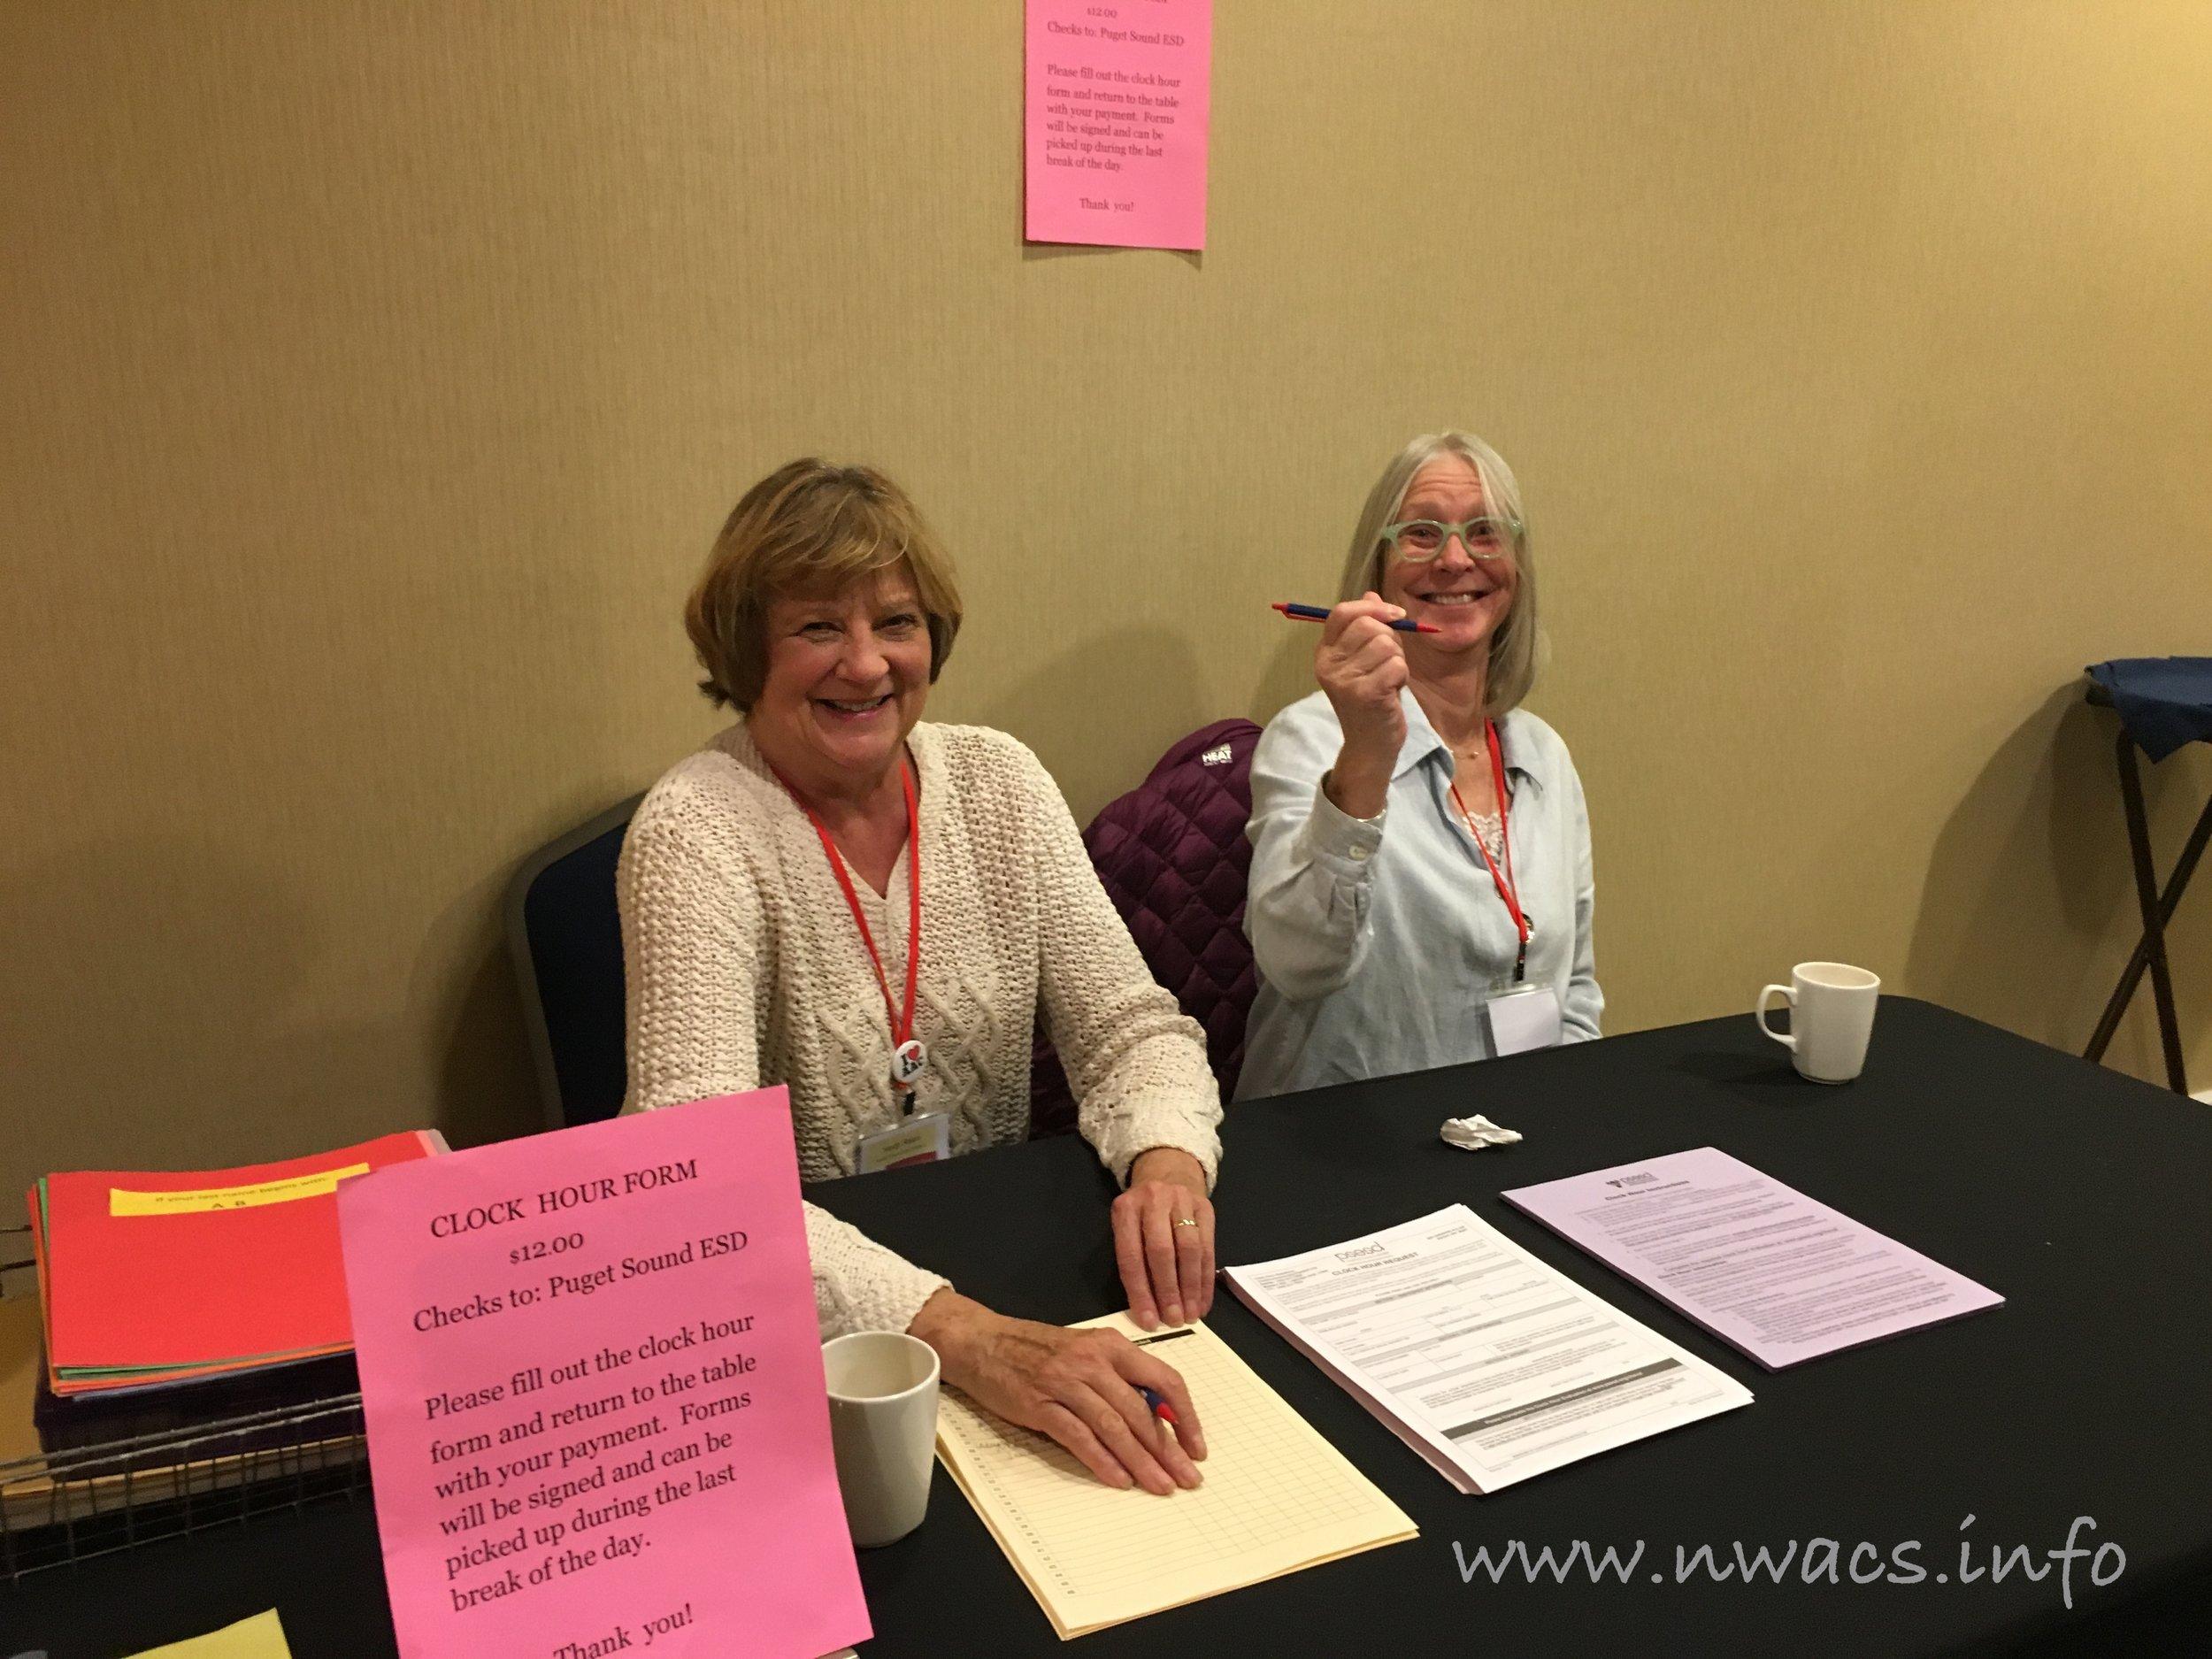 NWACS Board members Sandy & Jeri